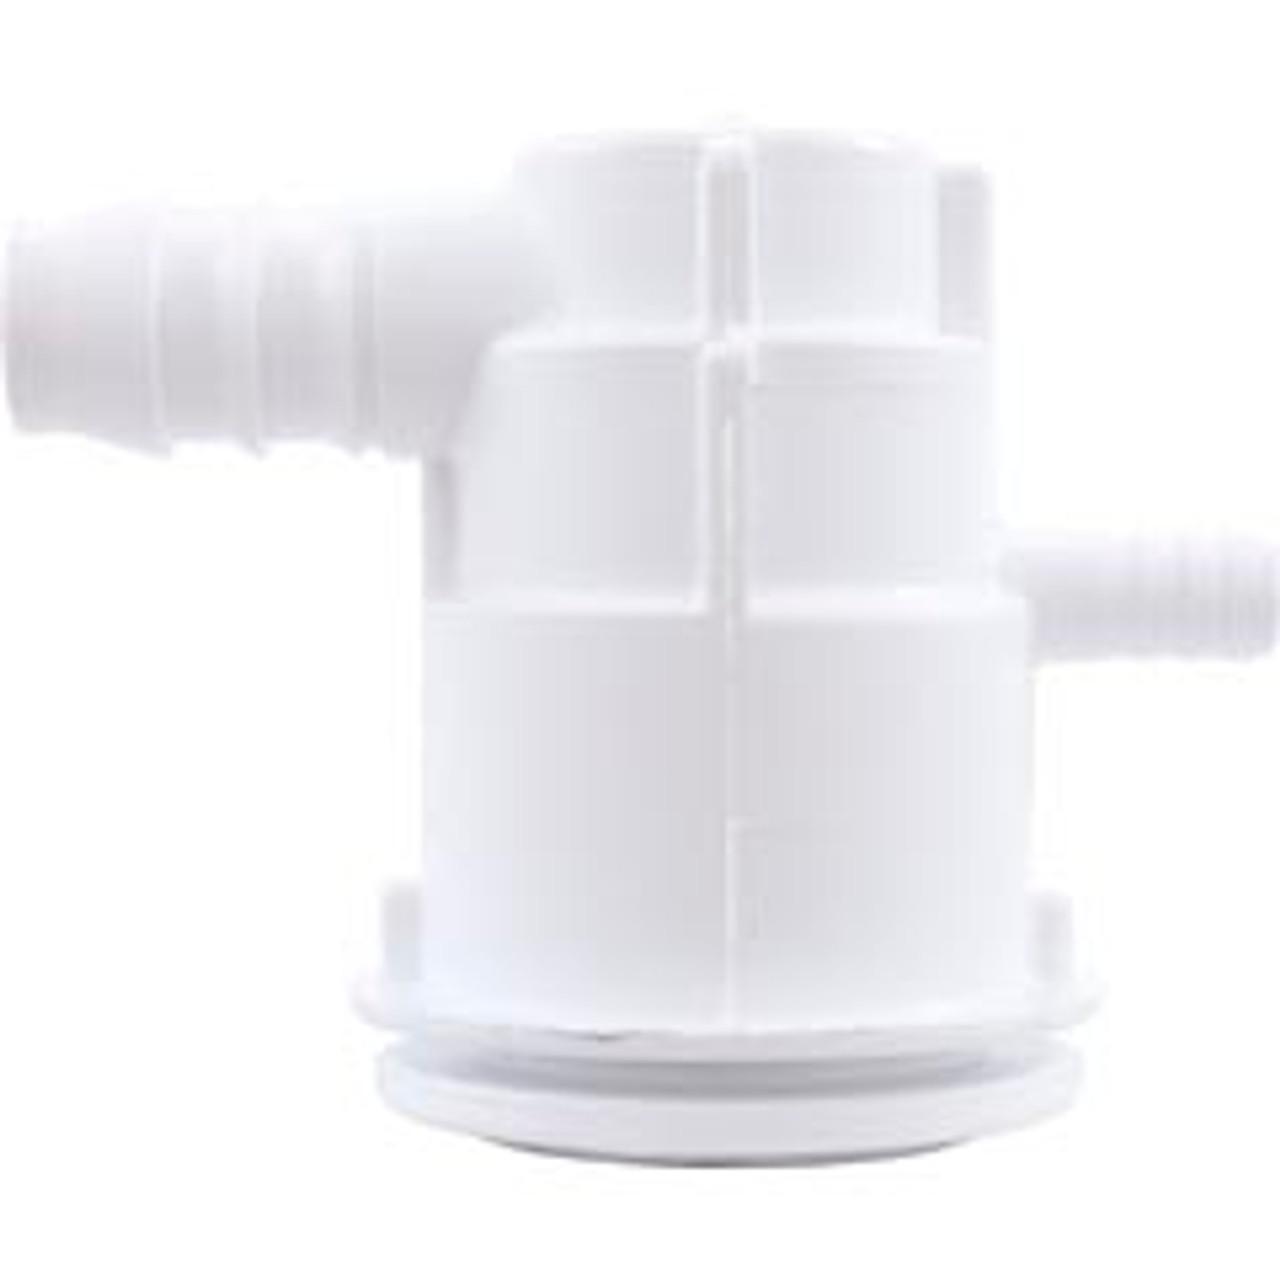 "222-1040, Waterway, Spa, Adjustable,  Mini, Jet, Body, 3/4"" RB X 3/8"" RB, FREE SHIPPING _222-1040 , 222-1040 , 222-1040-OS , 2221040 , 610184 , 806105059253 , 9406-01 , WW2221040 , WWP-85-8941, hot tub"